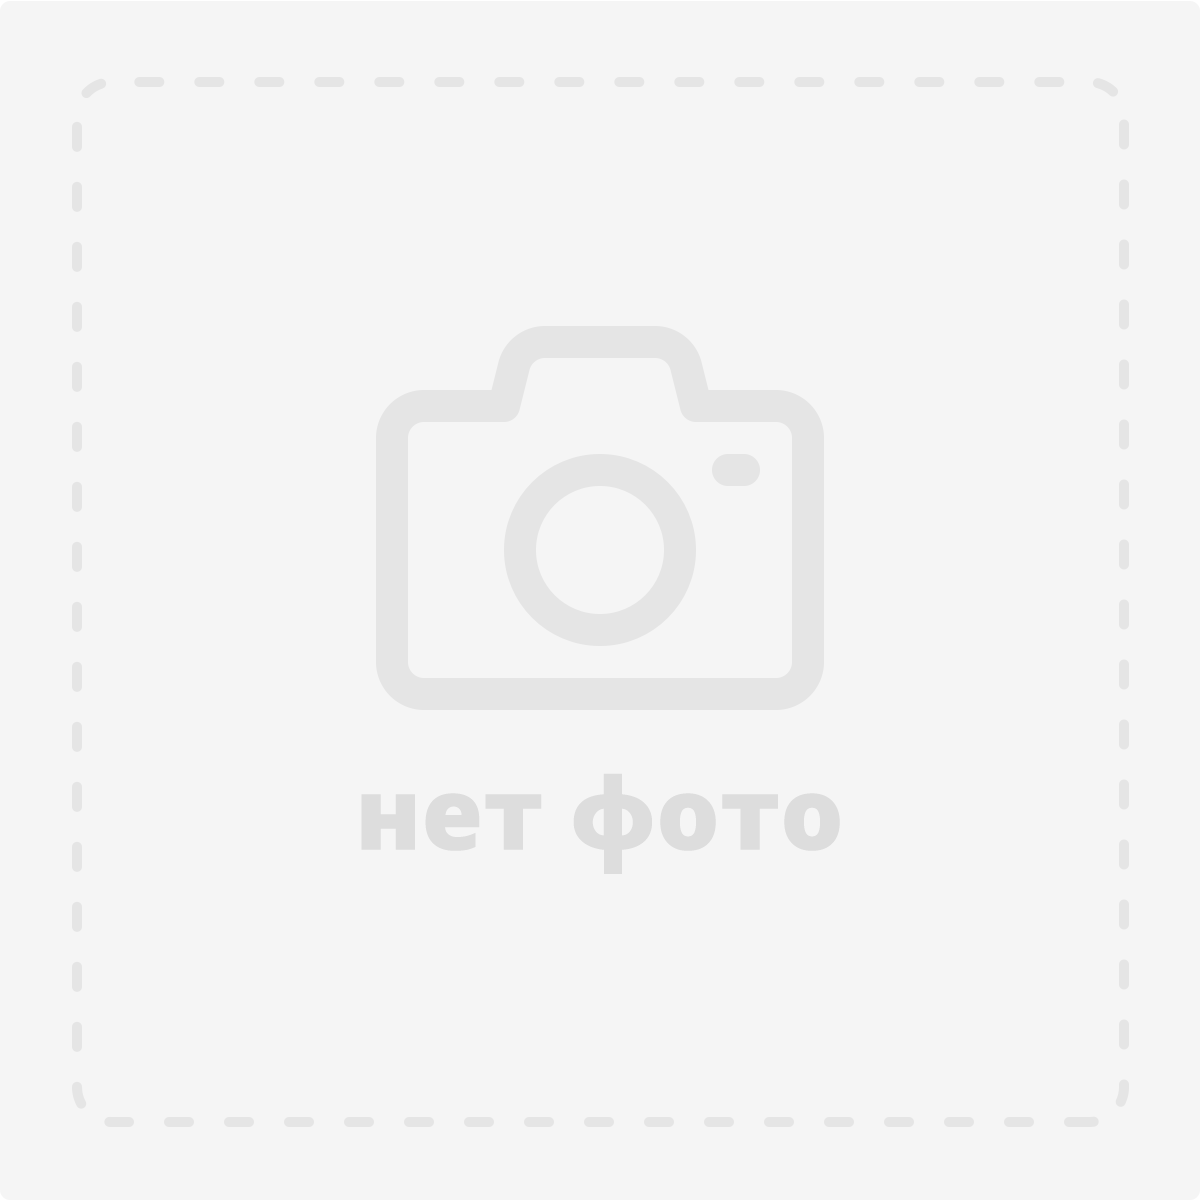 Завершен опрос «Монета года в Латвии»